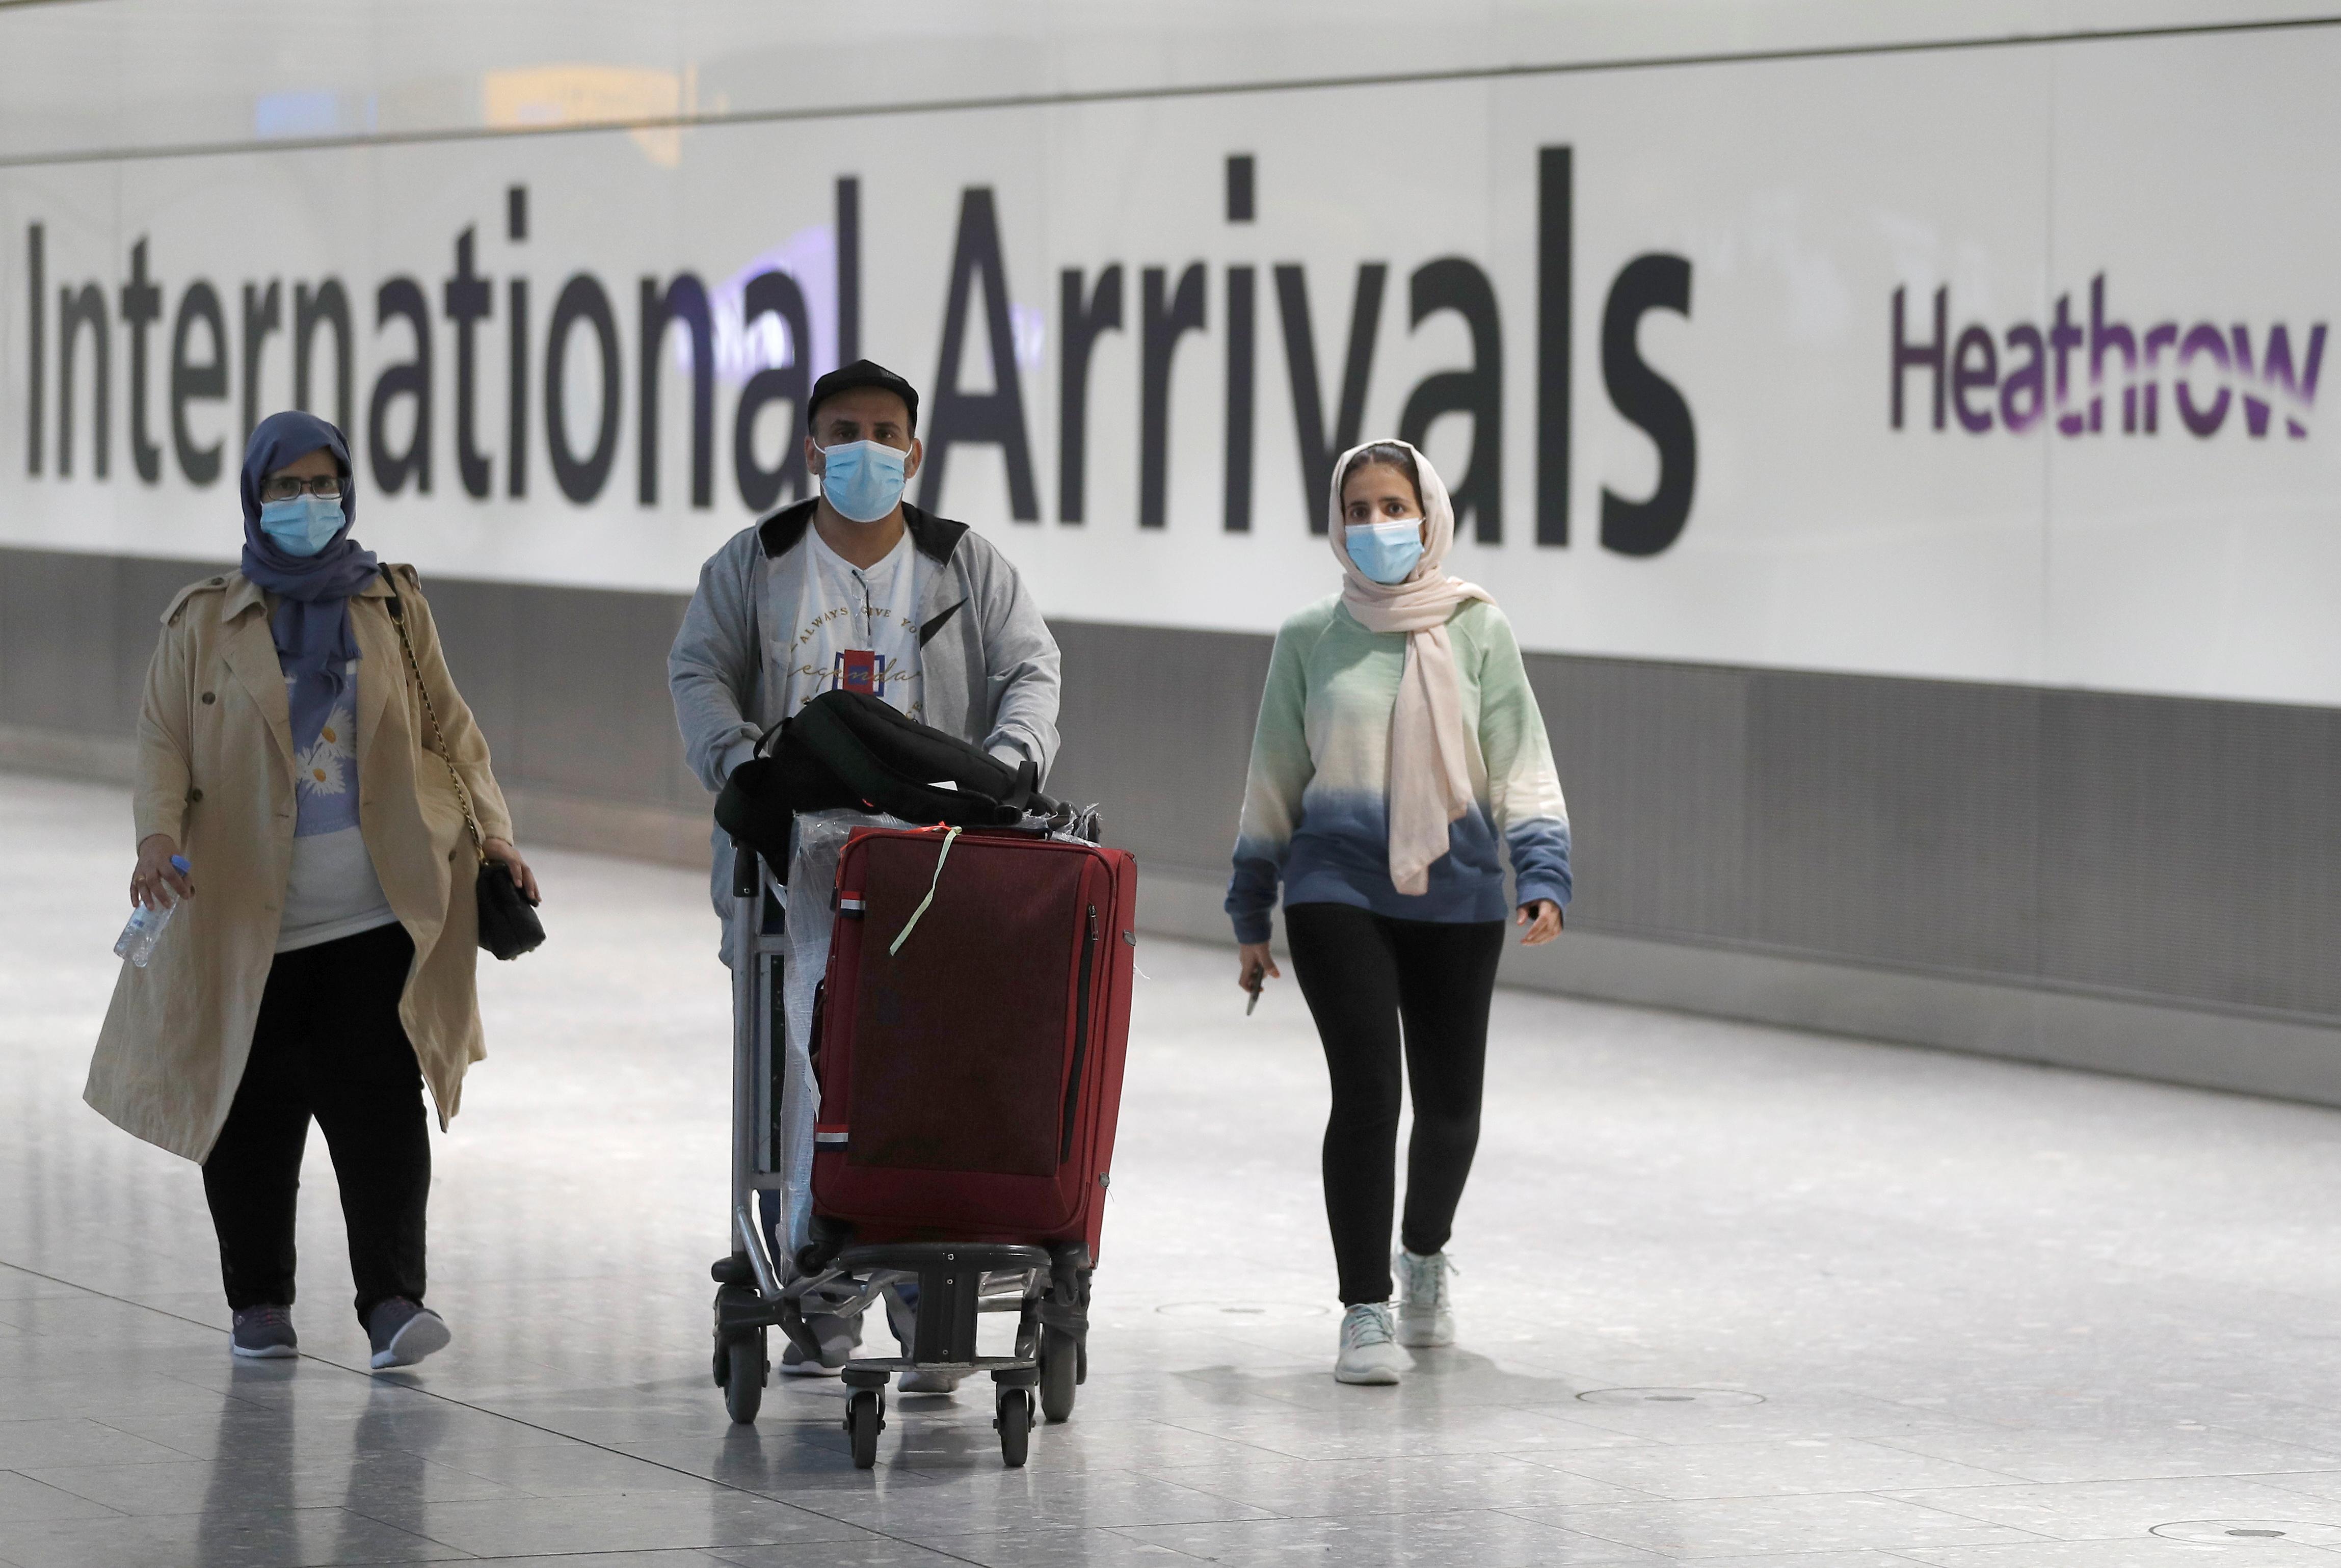 Passengers walk through the International arrivals area of Terminal 5 in London's Heathrow Airport, Britain, August 2, 2021.  REUTERS/Peter Nicholls